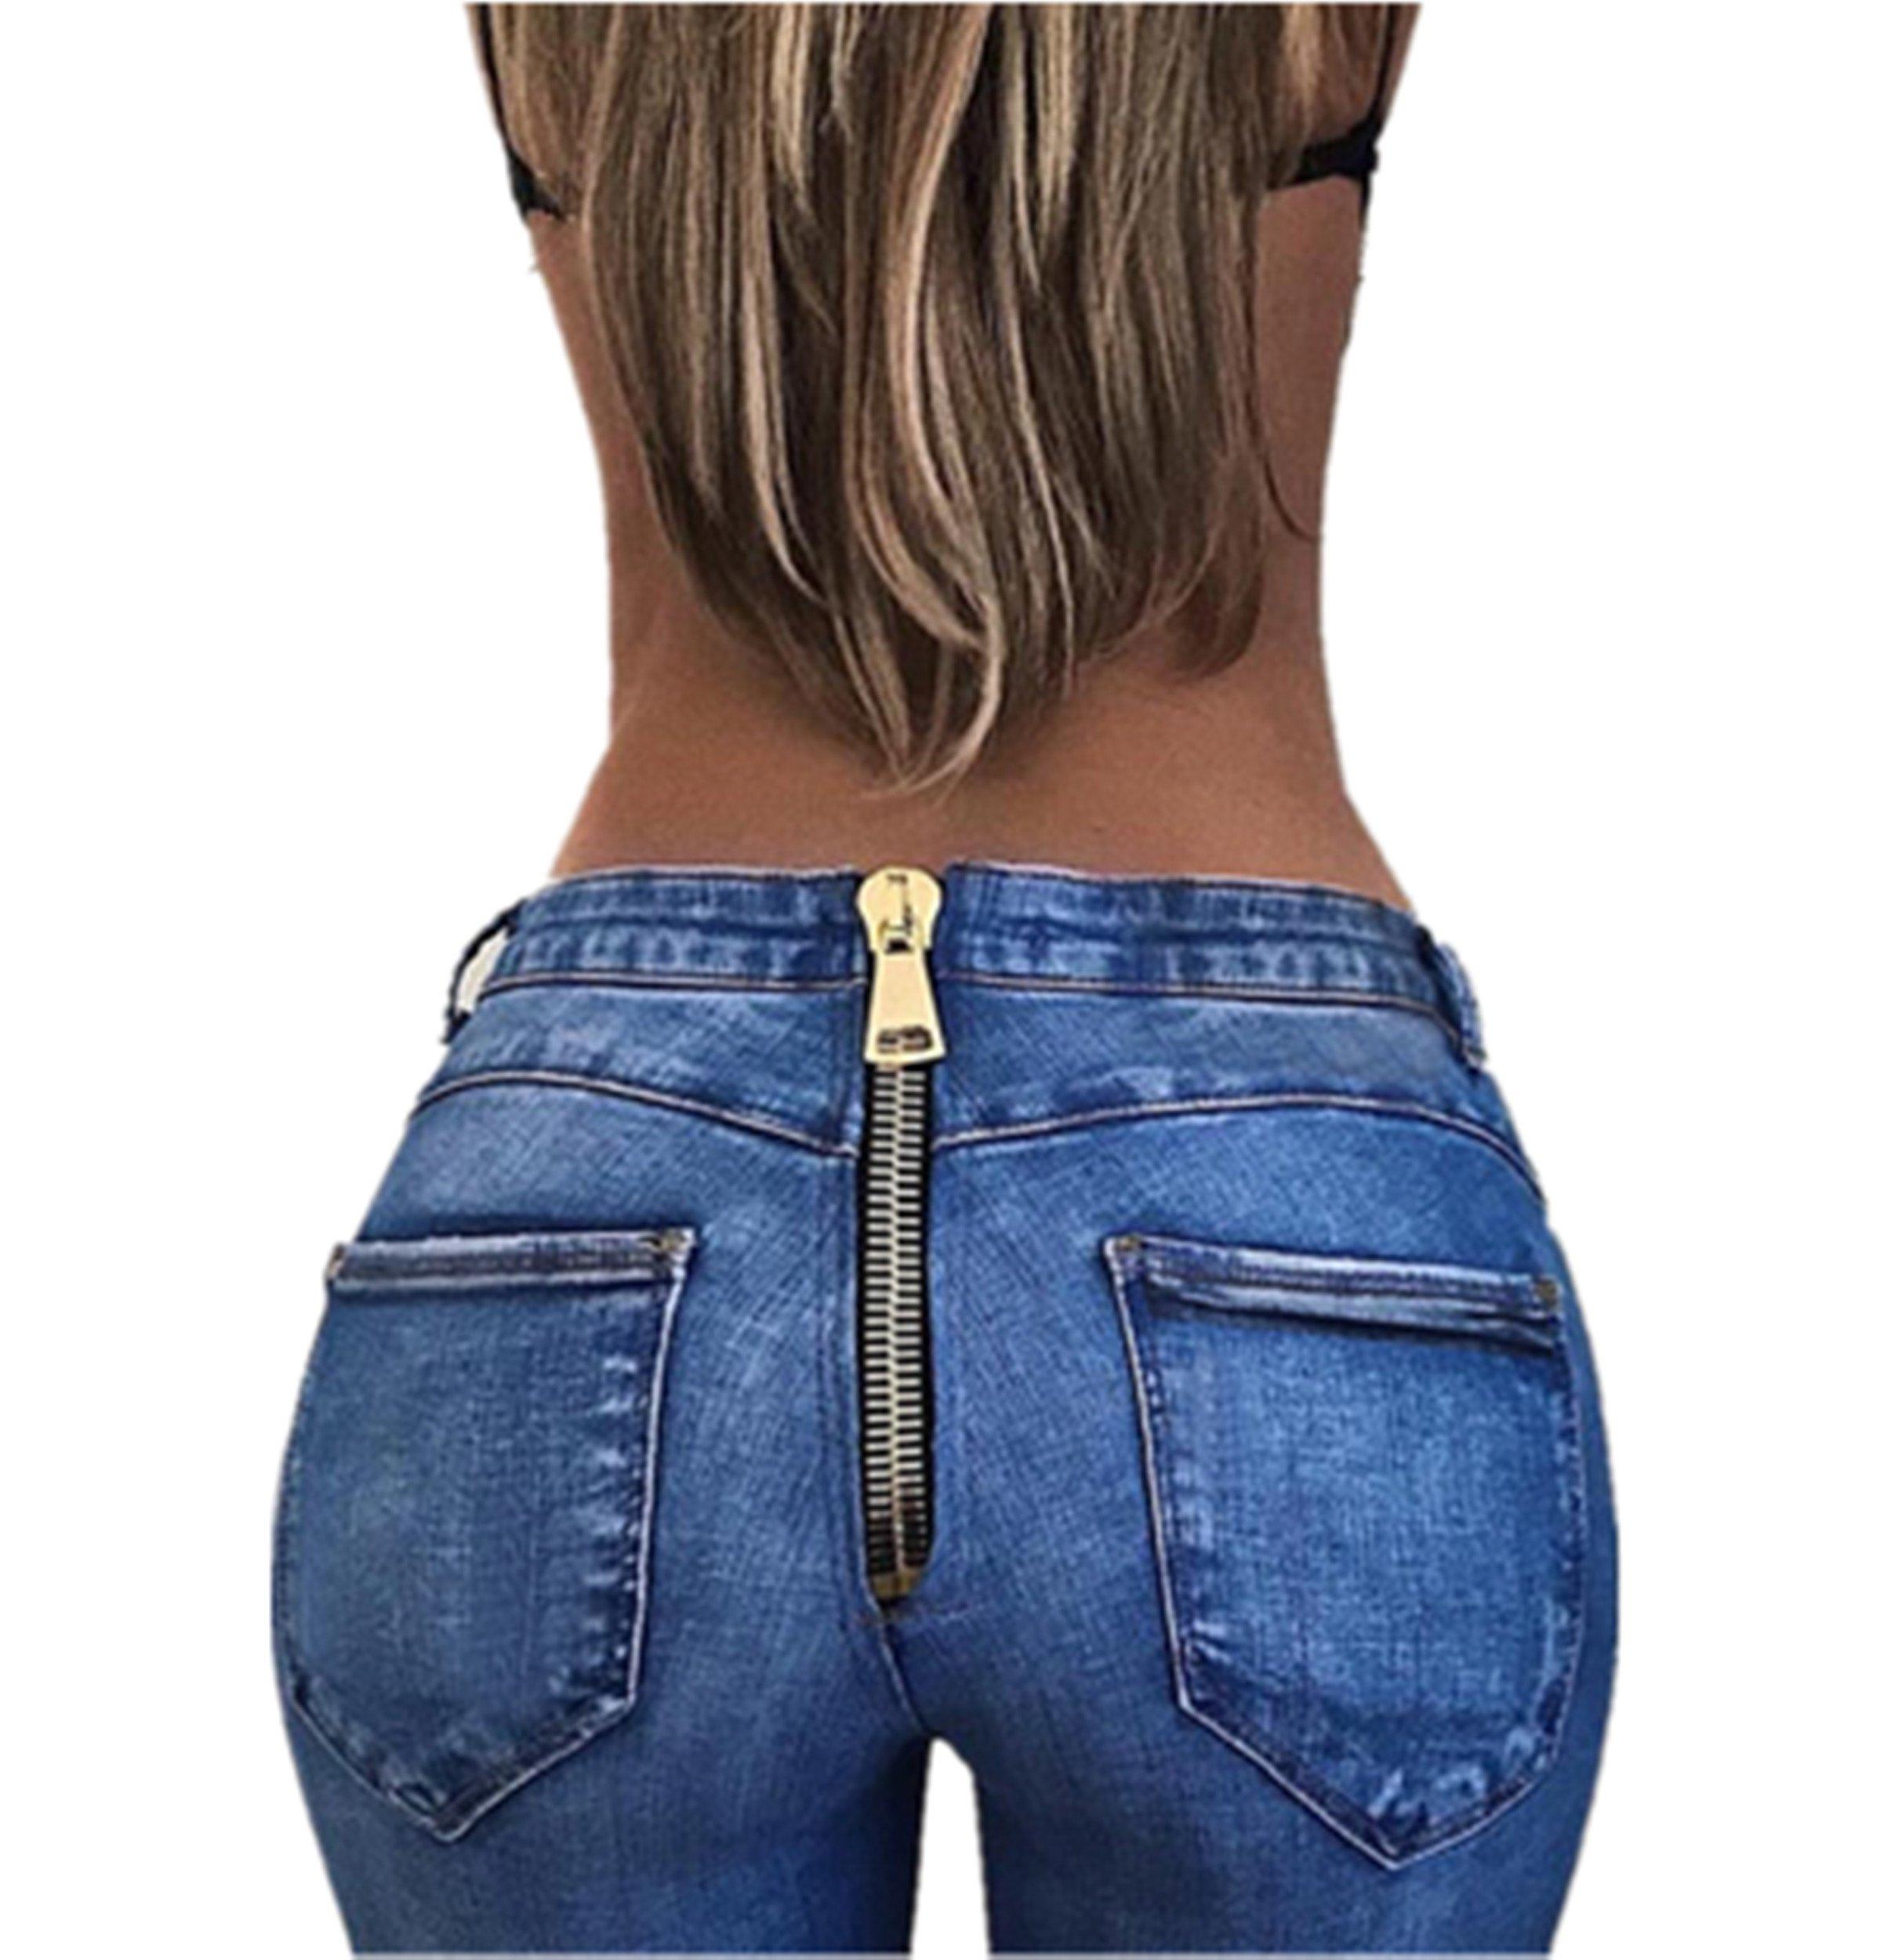 VIGVOG High Waist Jeans For Women Back Zipper Skinny Pencil Denim Pants Elastic Stretched Trousers